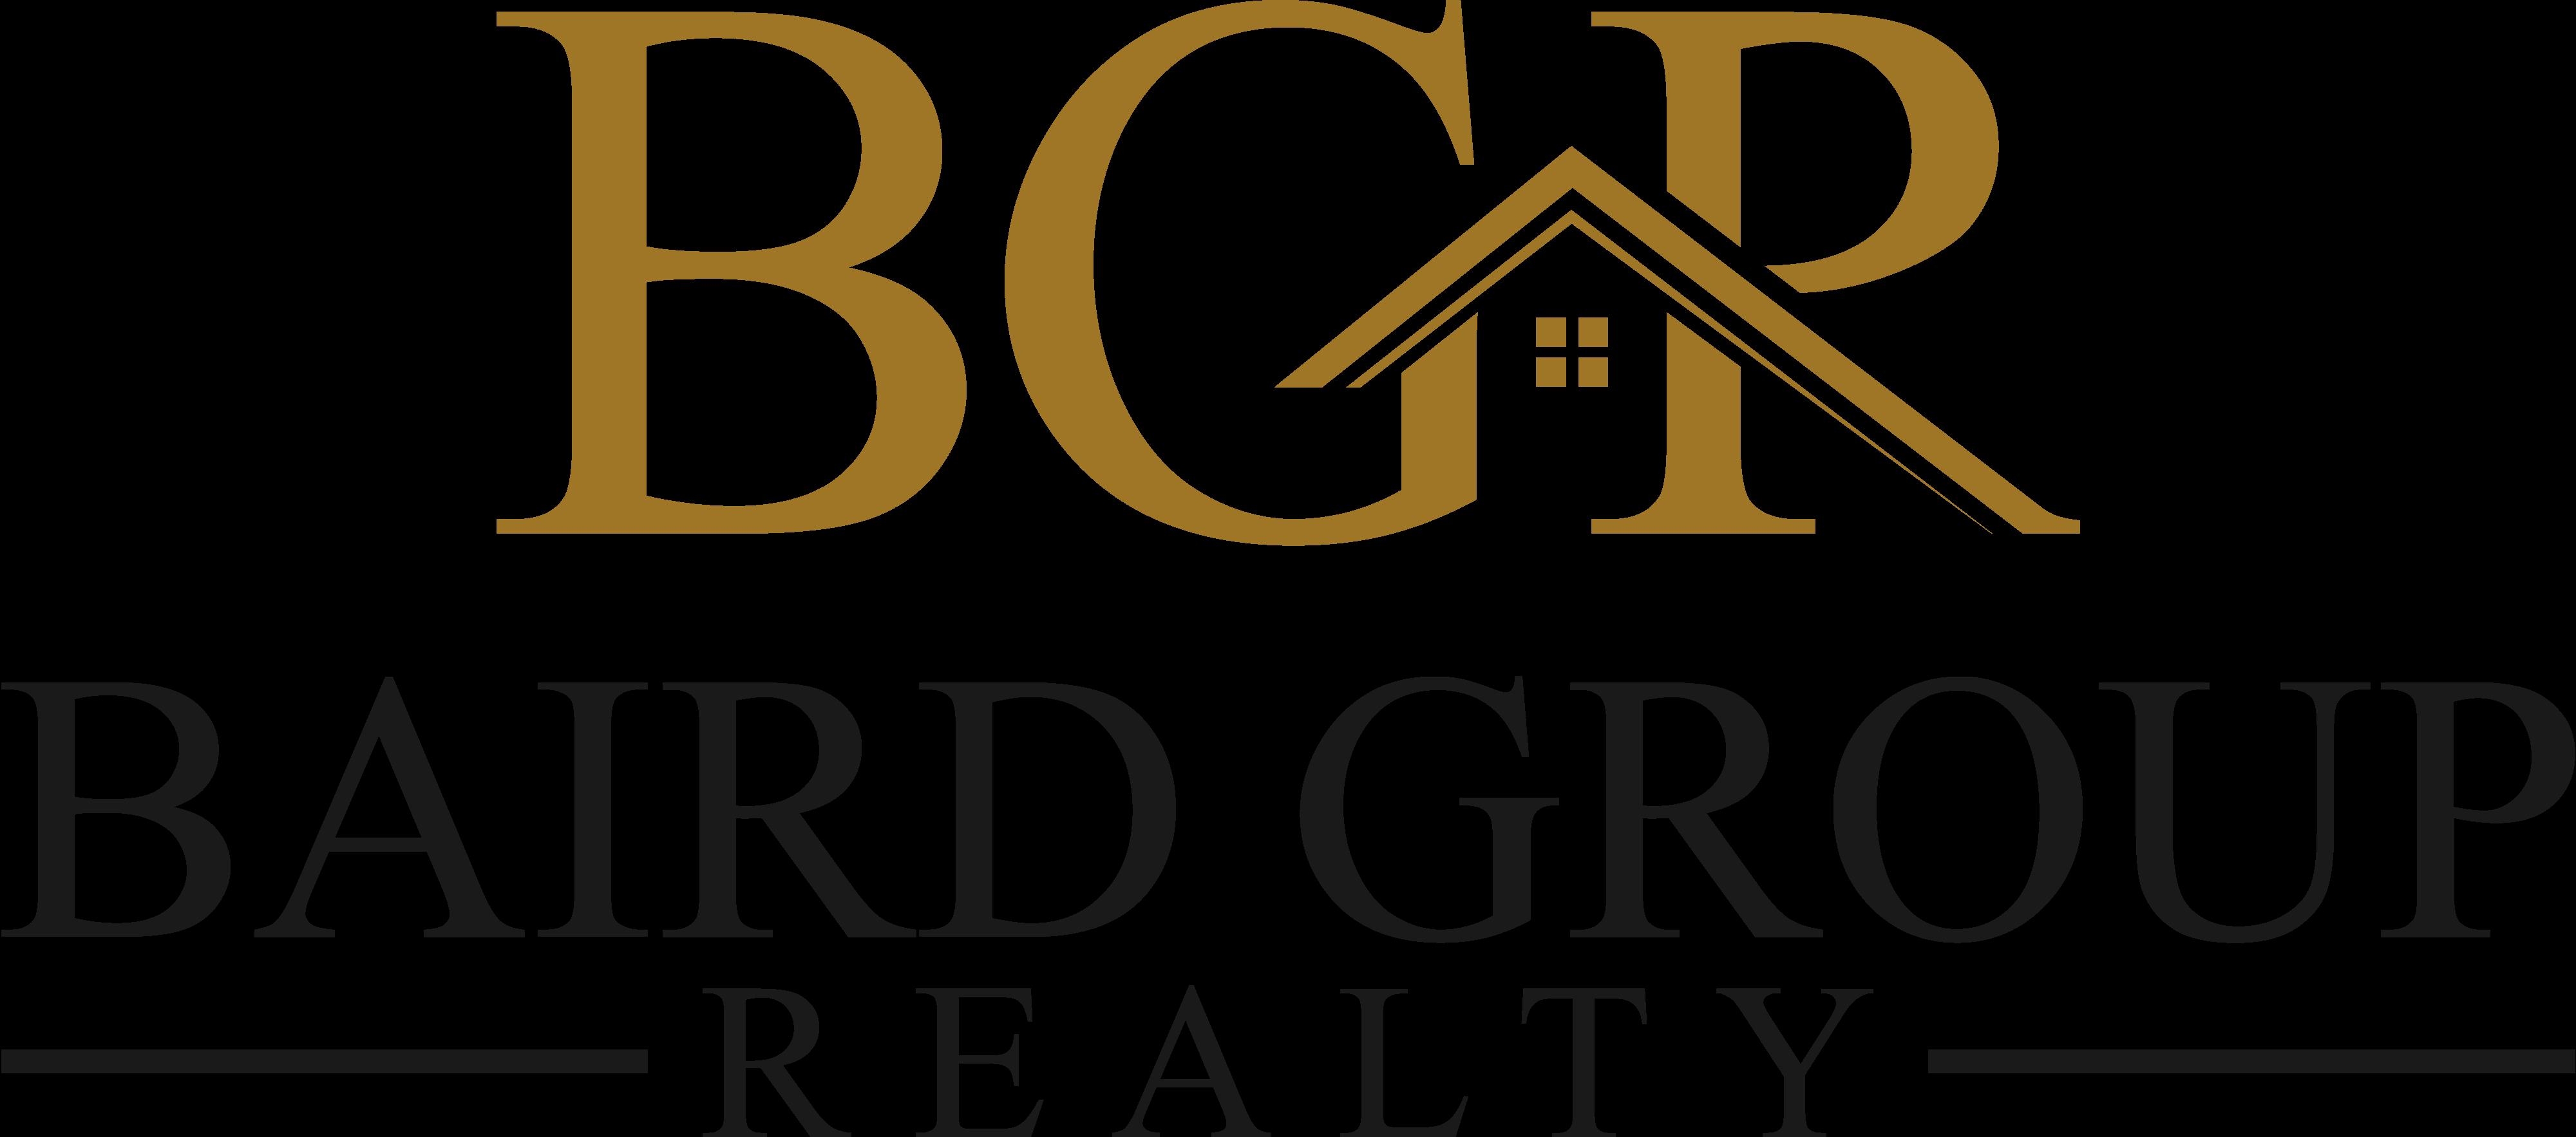 Baird Group Realty logo